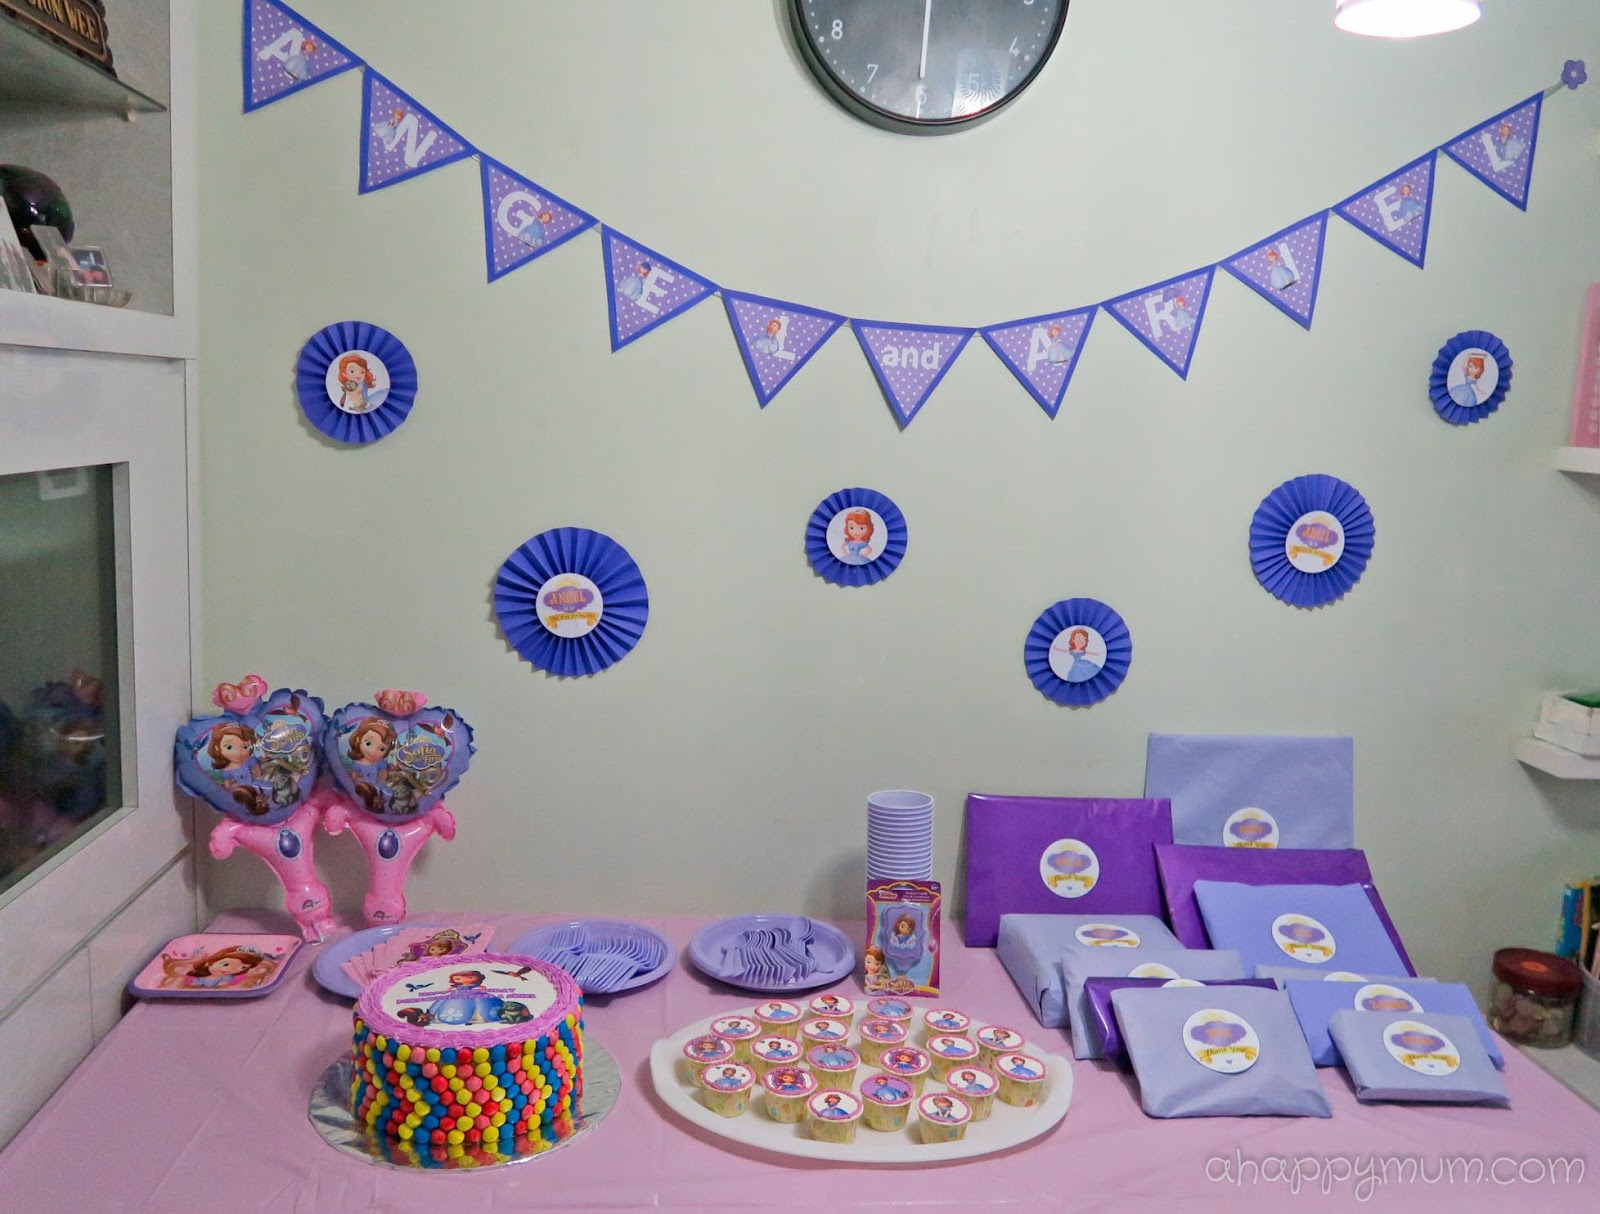 A happy mum singapore parenting blog - Princess party wall decorations ...